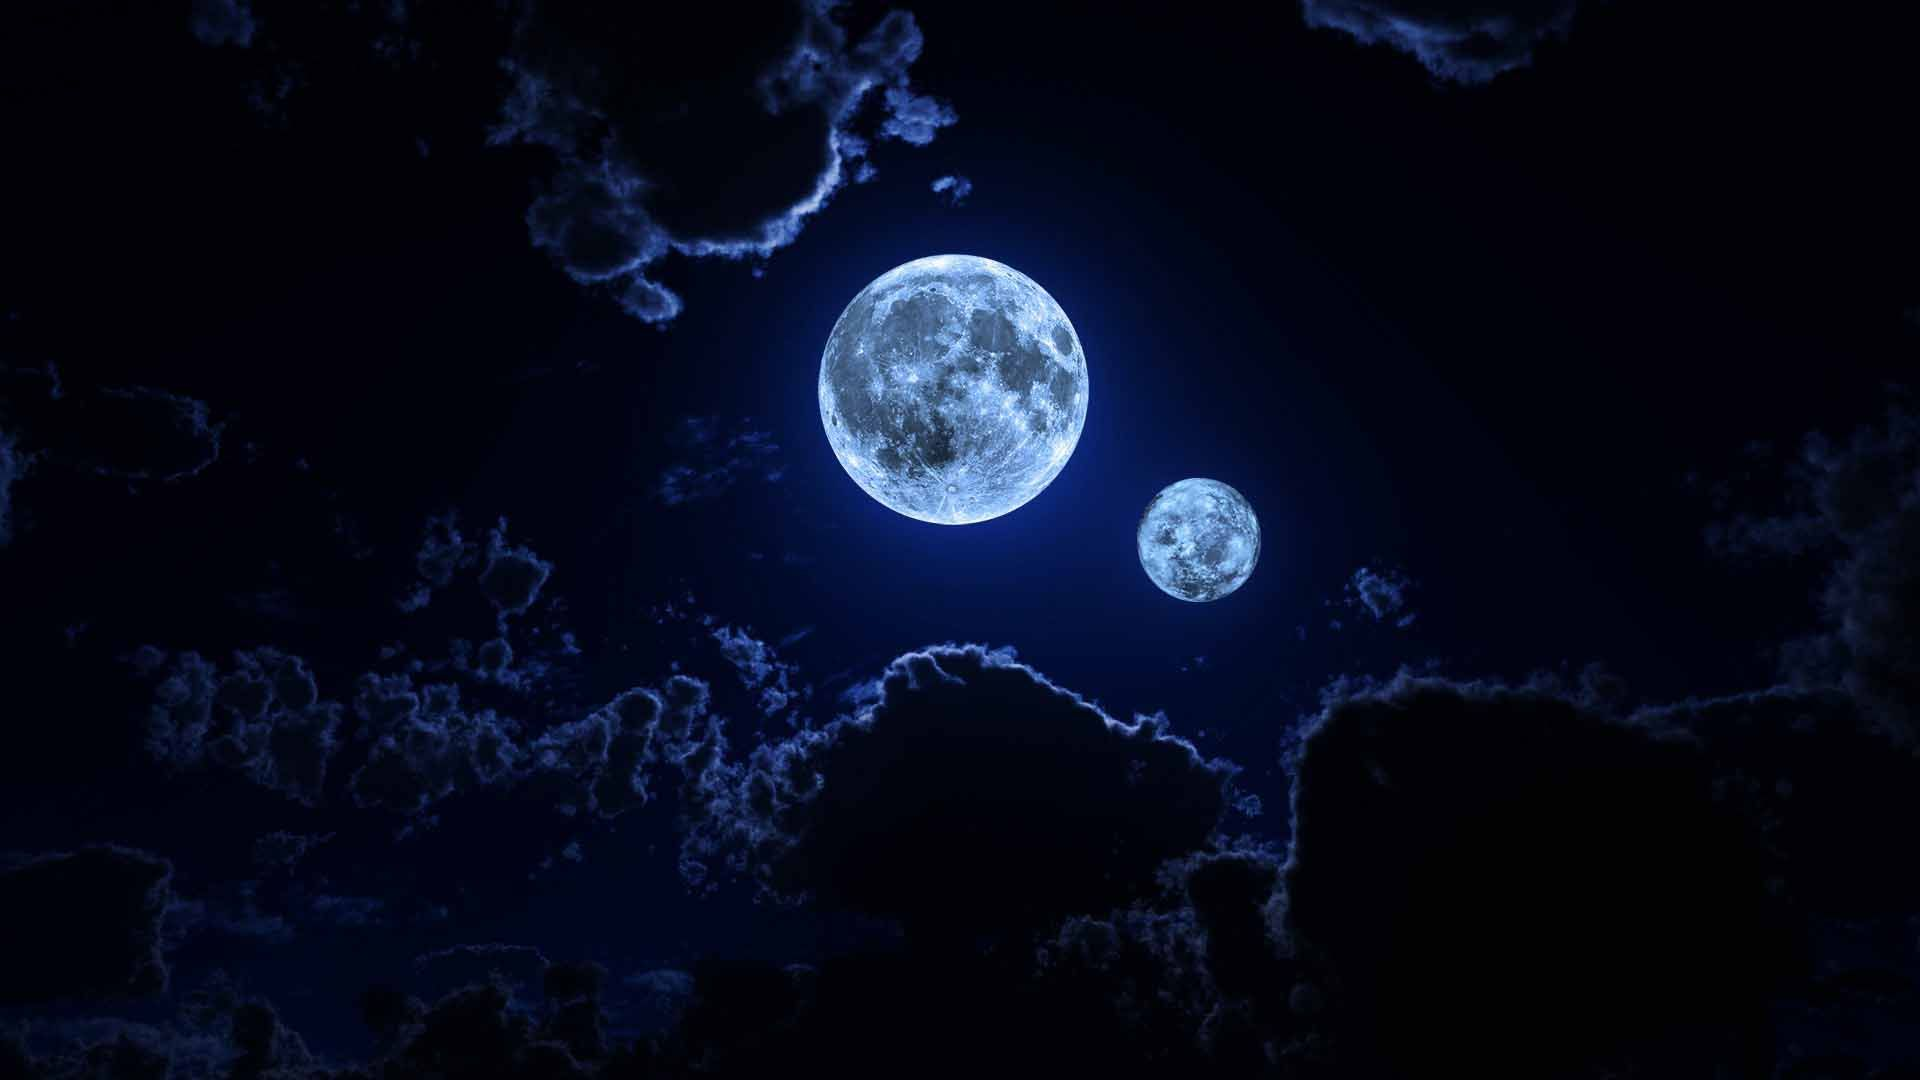 Amazing Night Sky Wallpaper #6770172